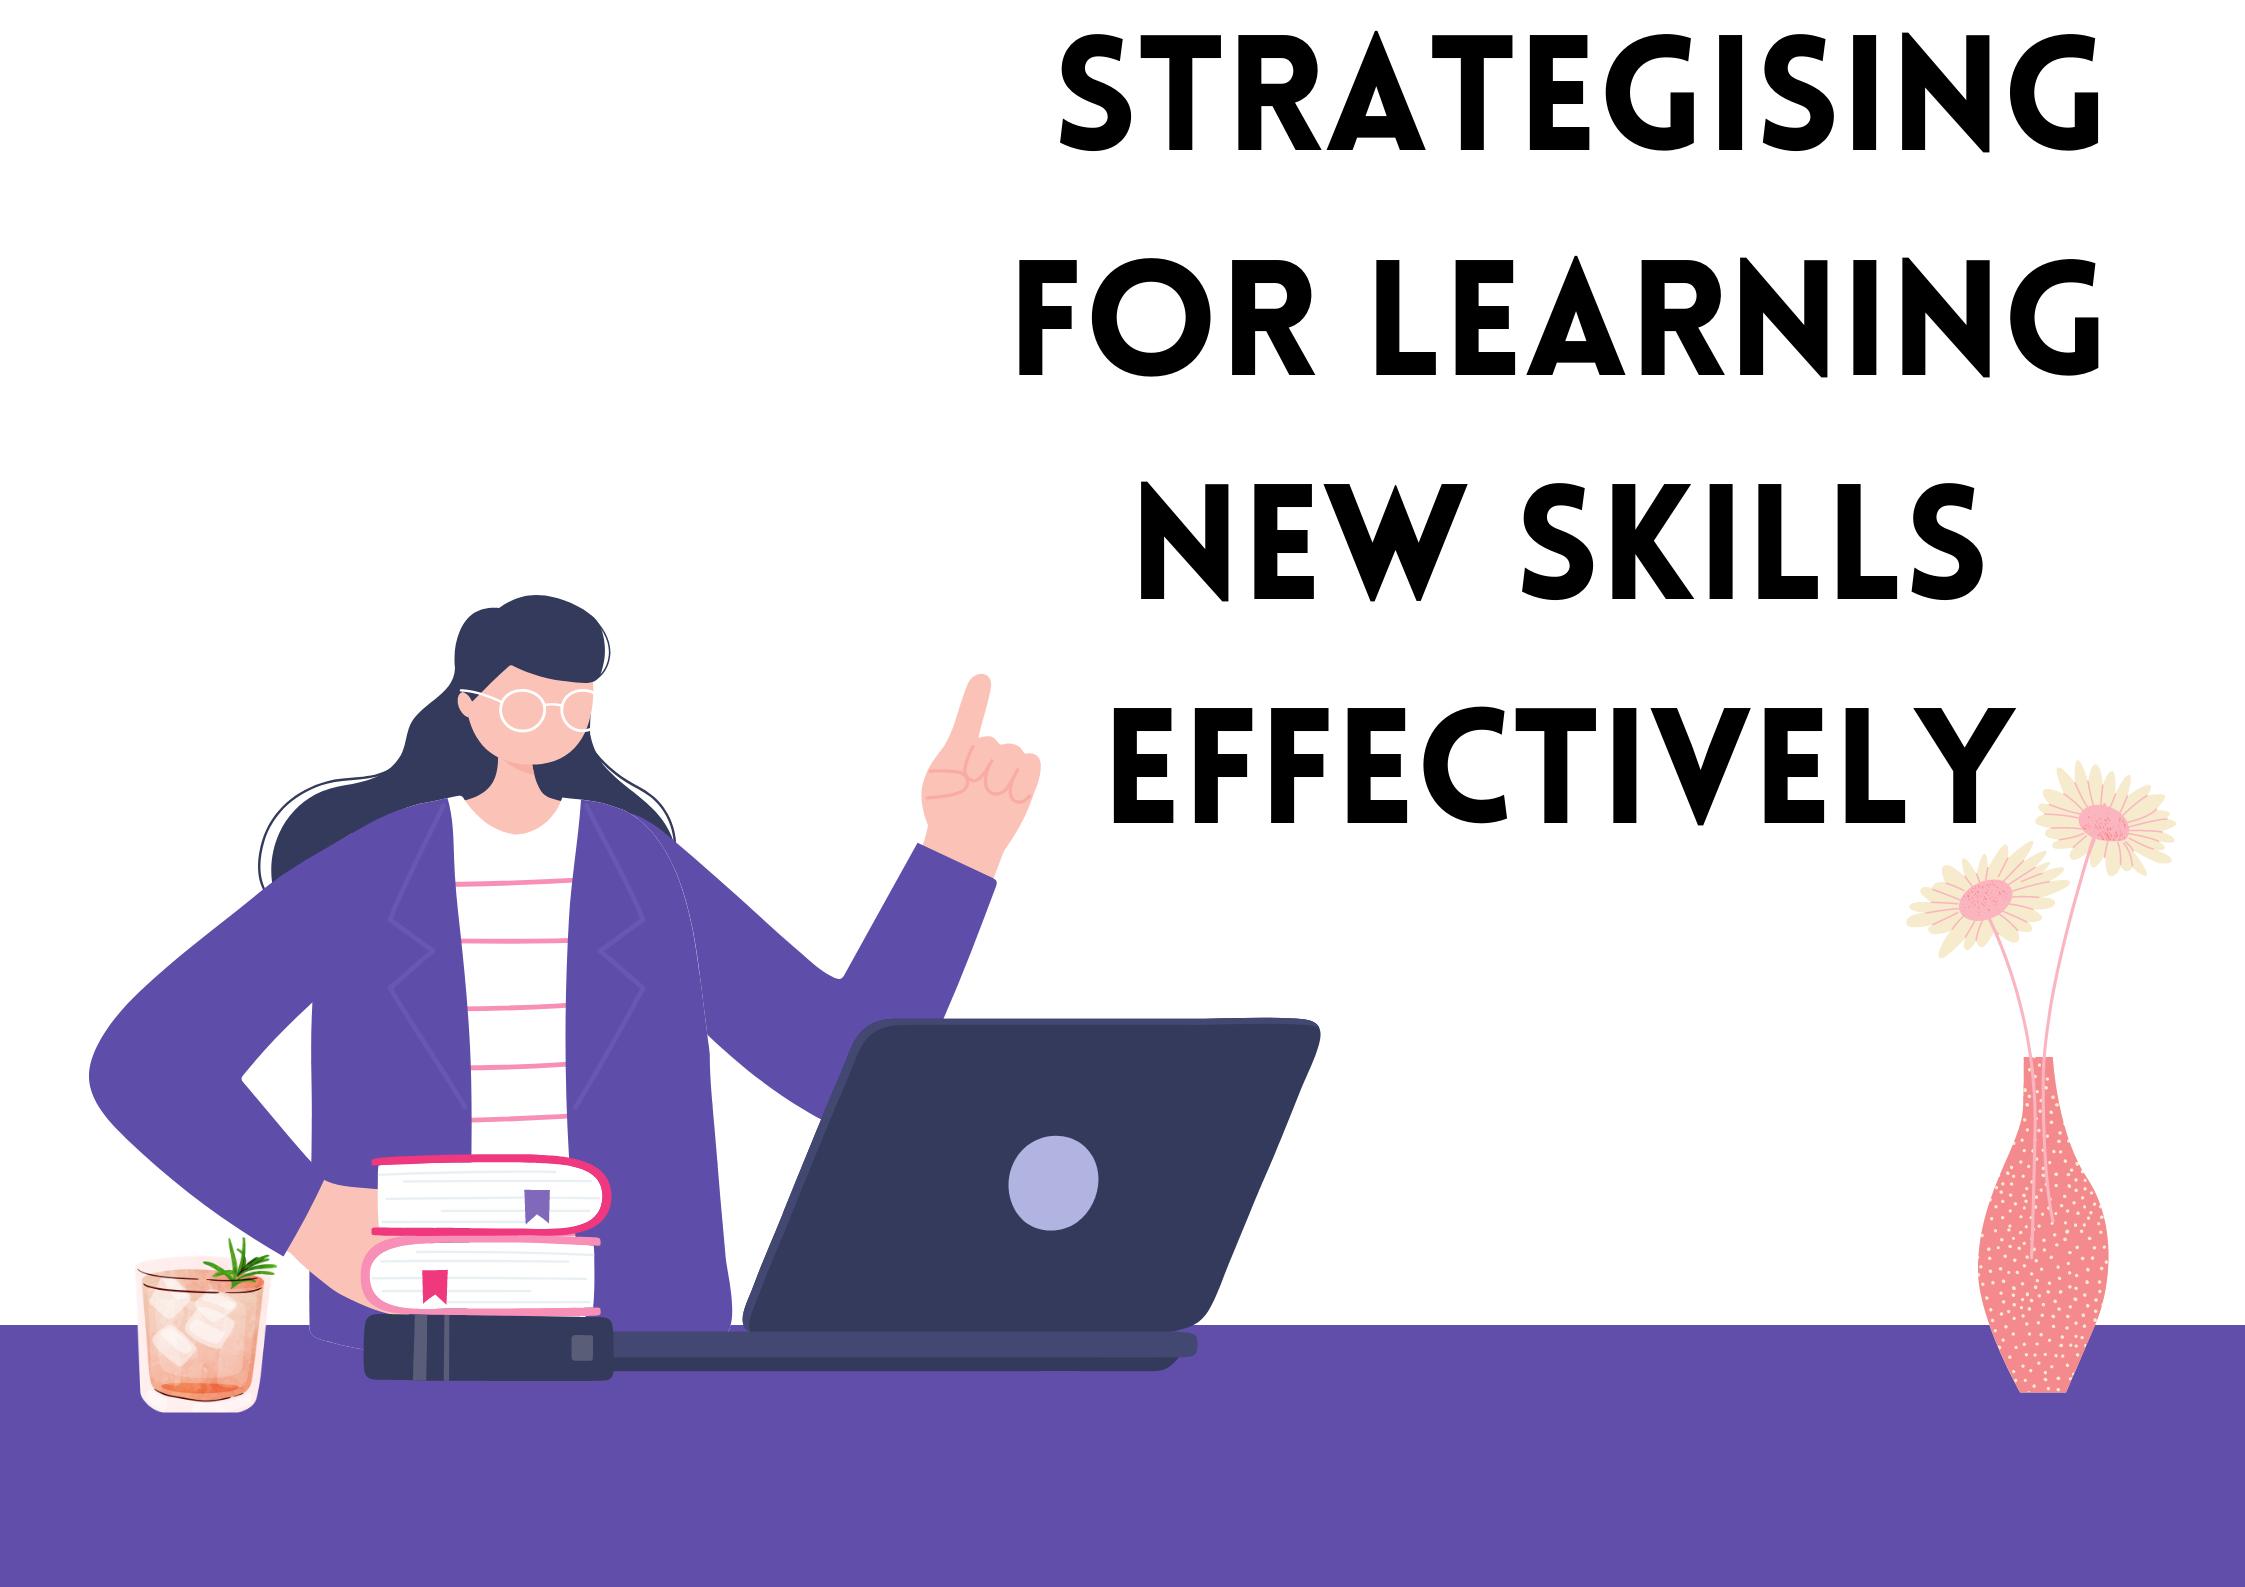 Strategising-for-Learning-New-Skills-Effectively